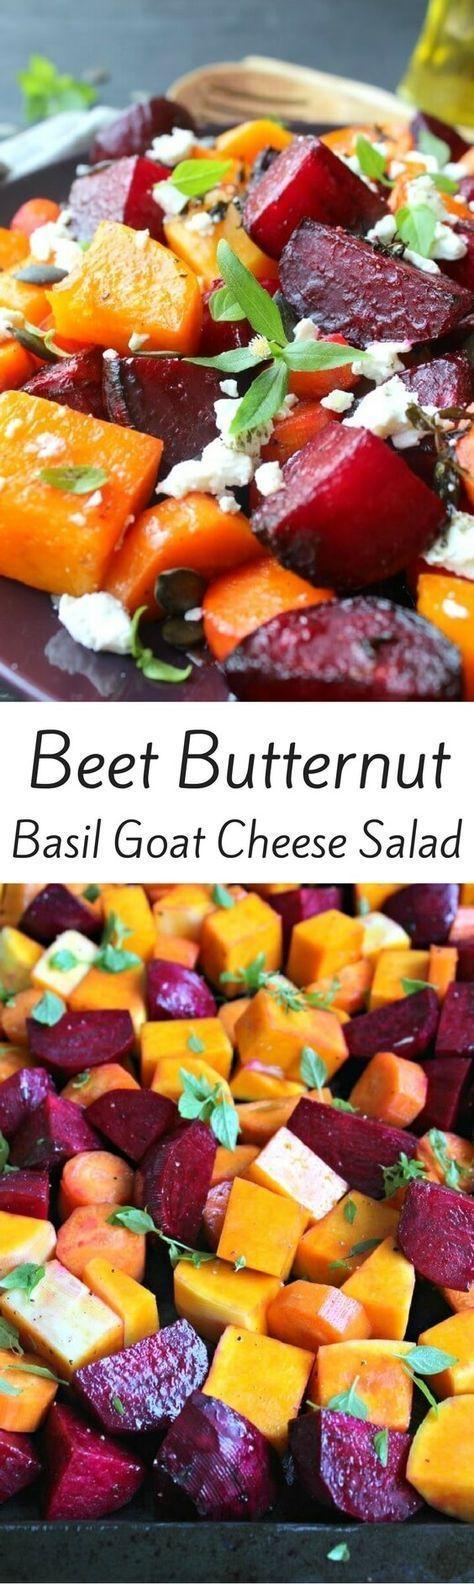 331cc3063fe371a2ef38f8981c3b12b6 Beet Butternut Squash Basil Goat Cheese Salad (minus cheese for whole 30)